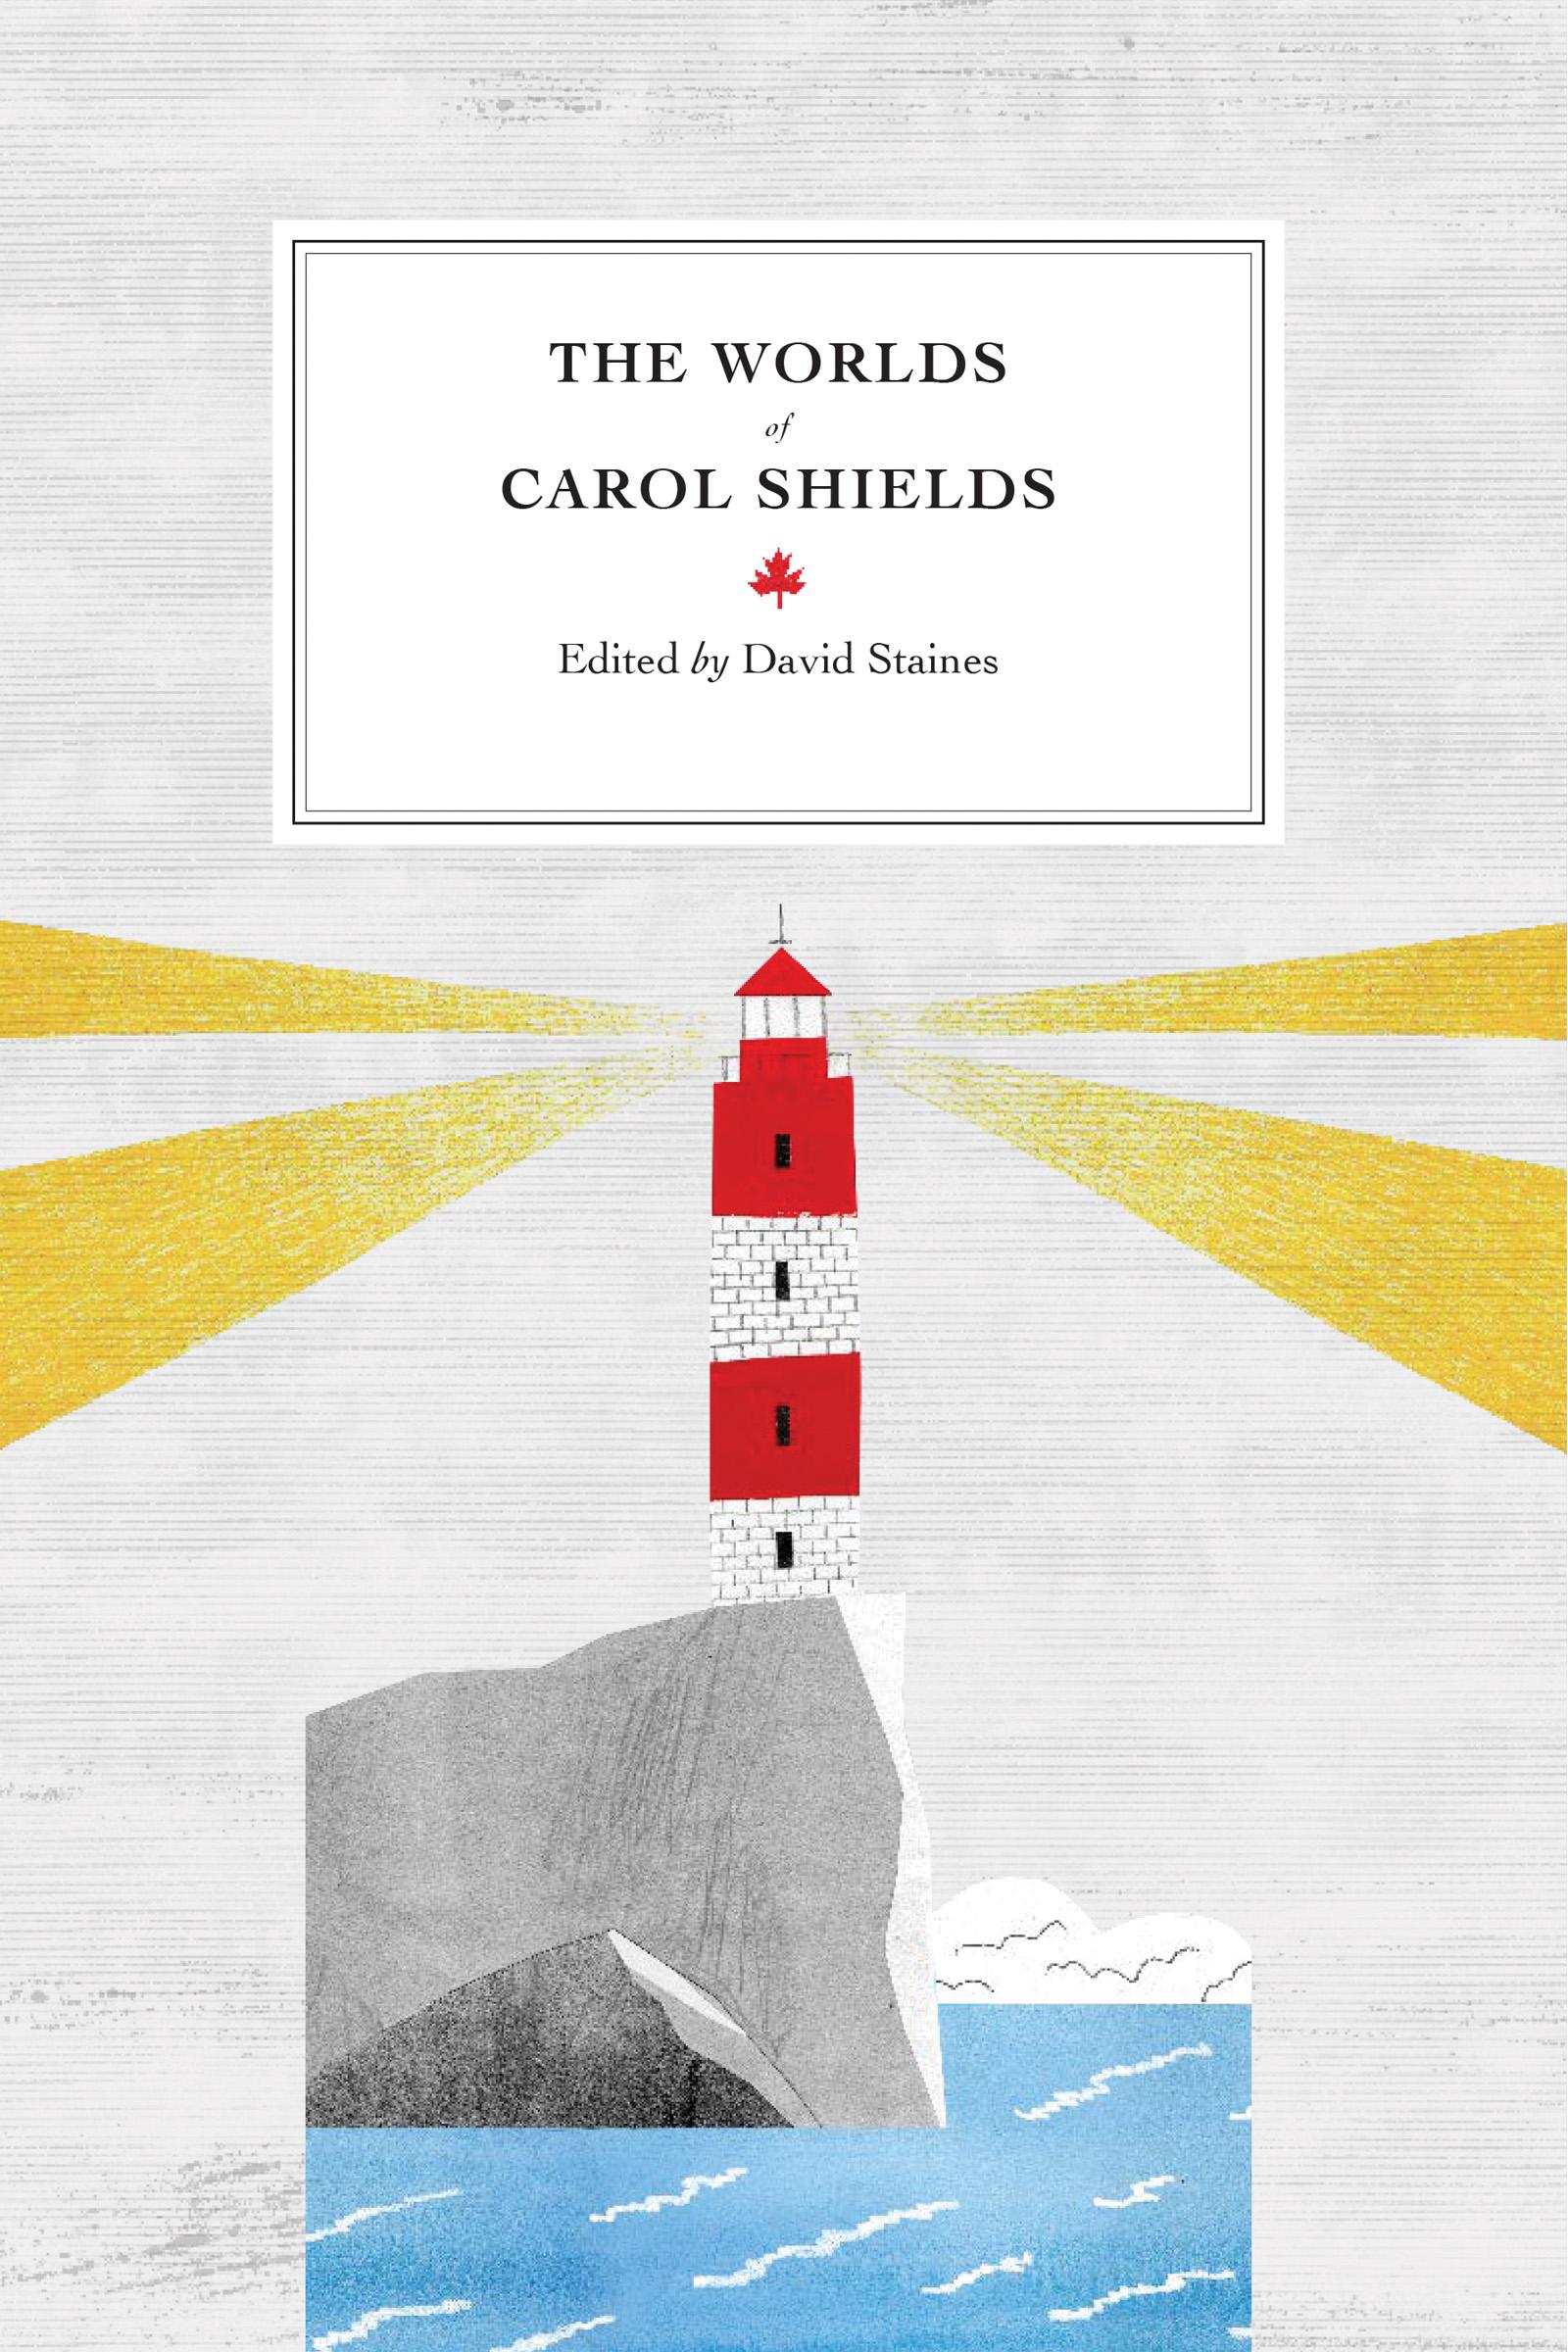 The Worlds of Carol Shields